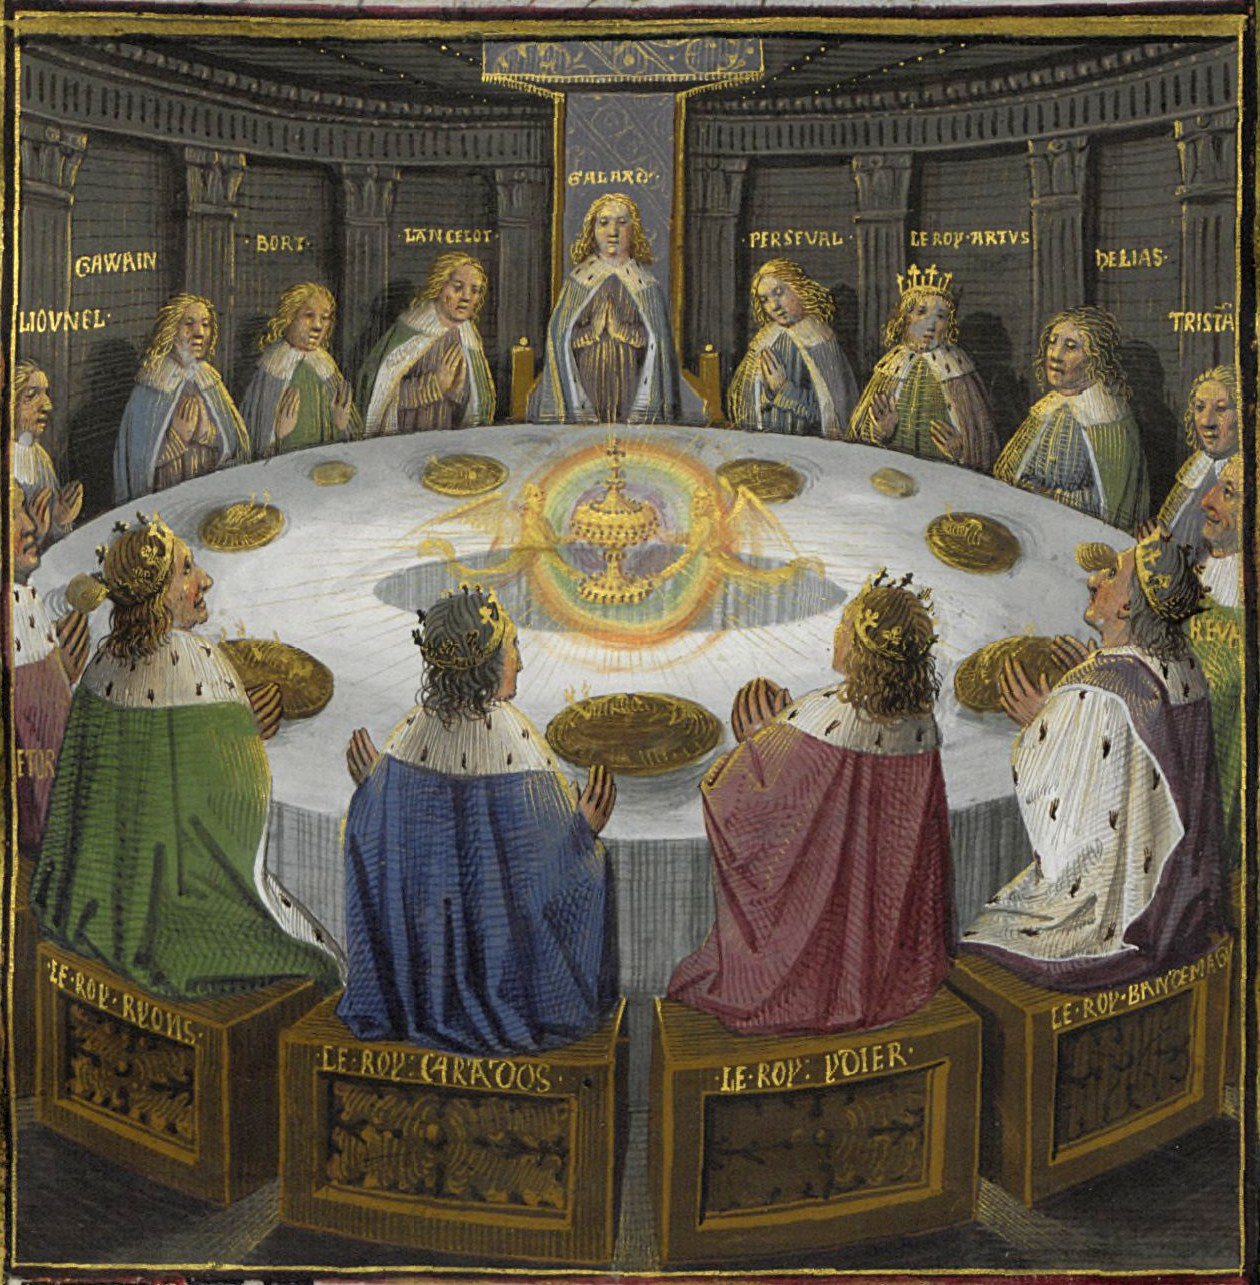 table ronde wikipedia